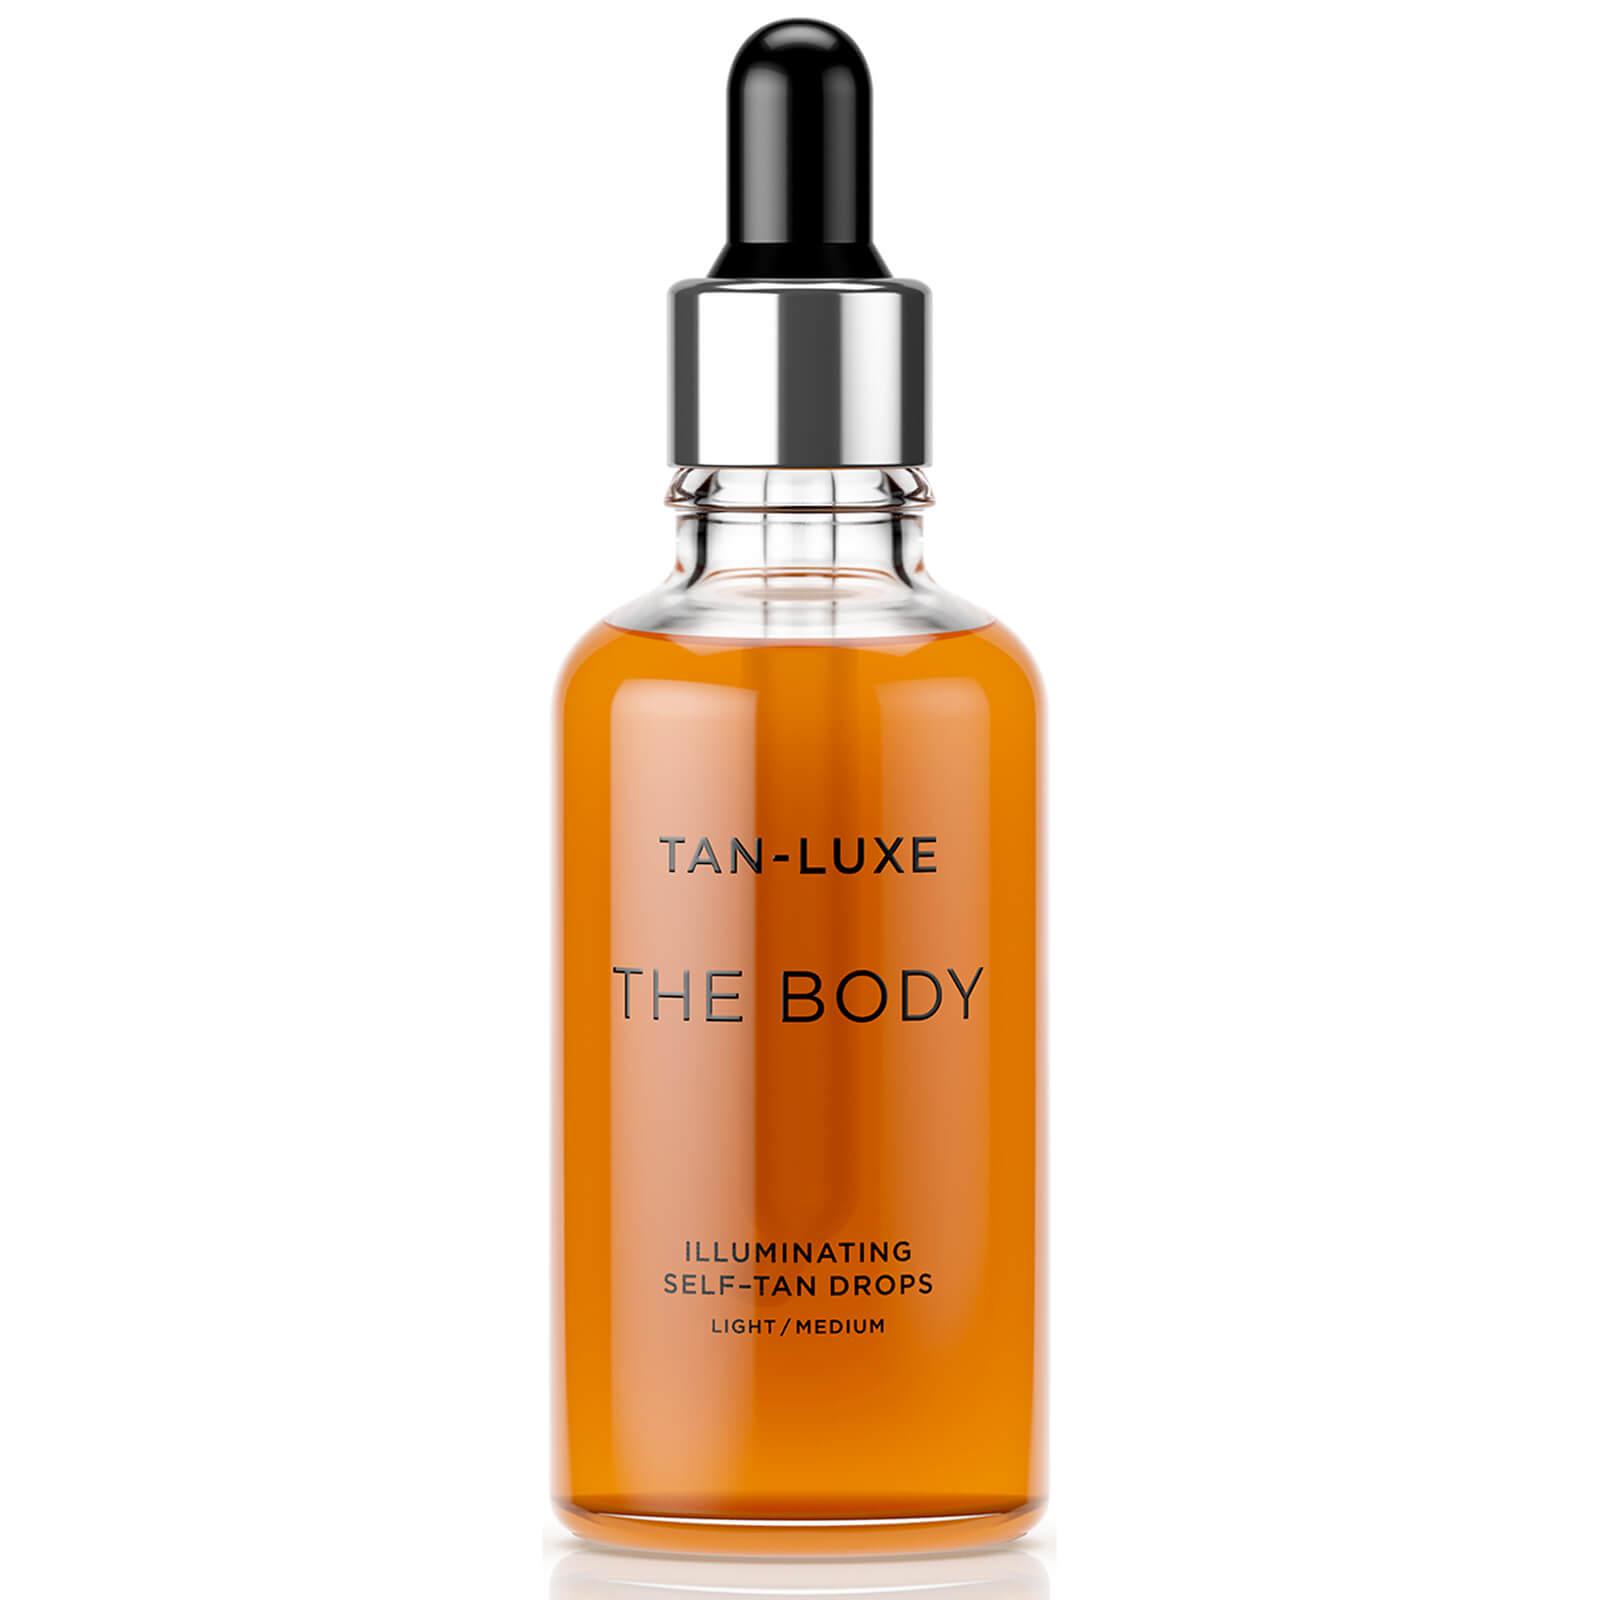 Tan-Luxe The Body Illuminating Self-Tan Drops 50ml - Light/Medium  - Купить